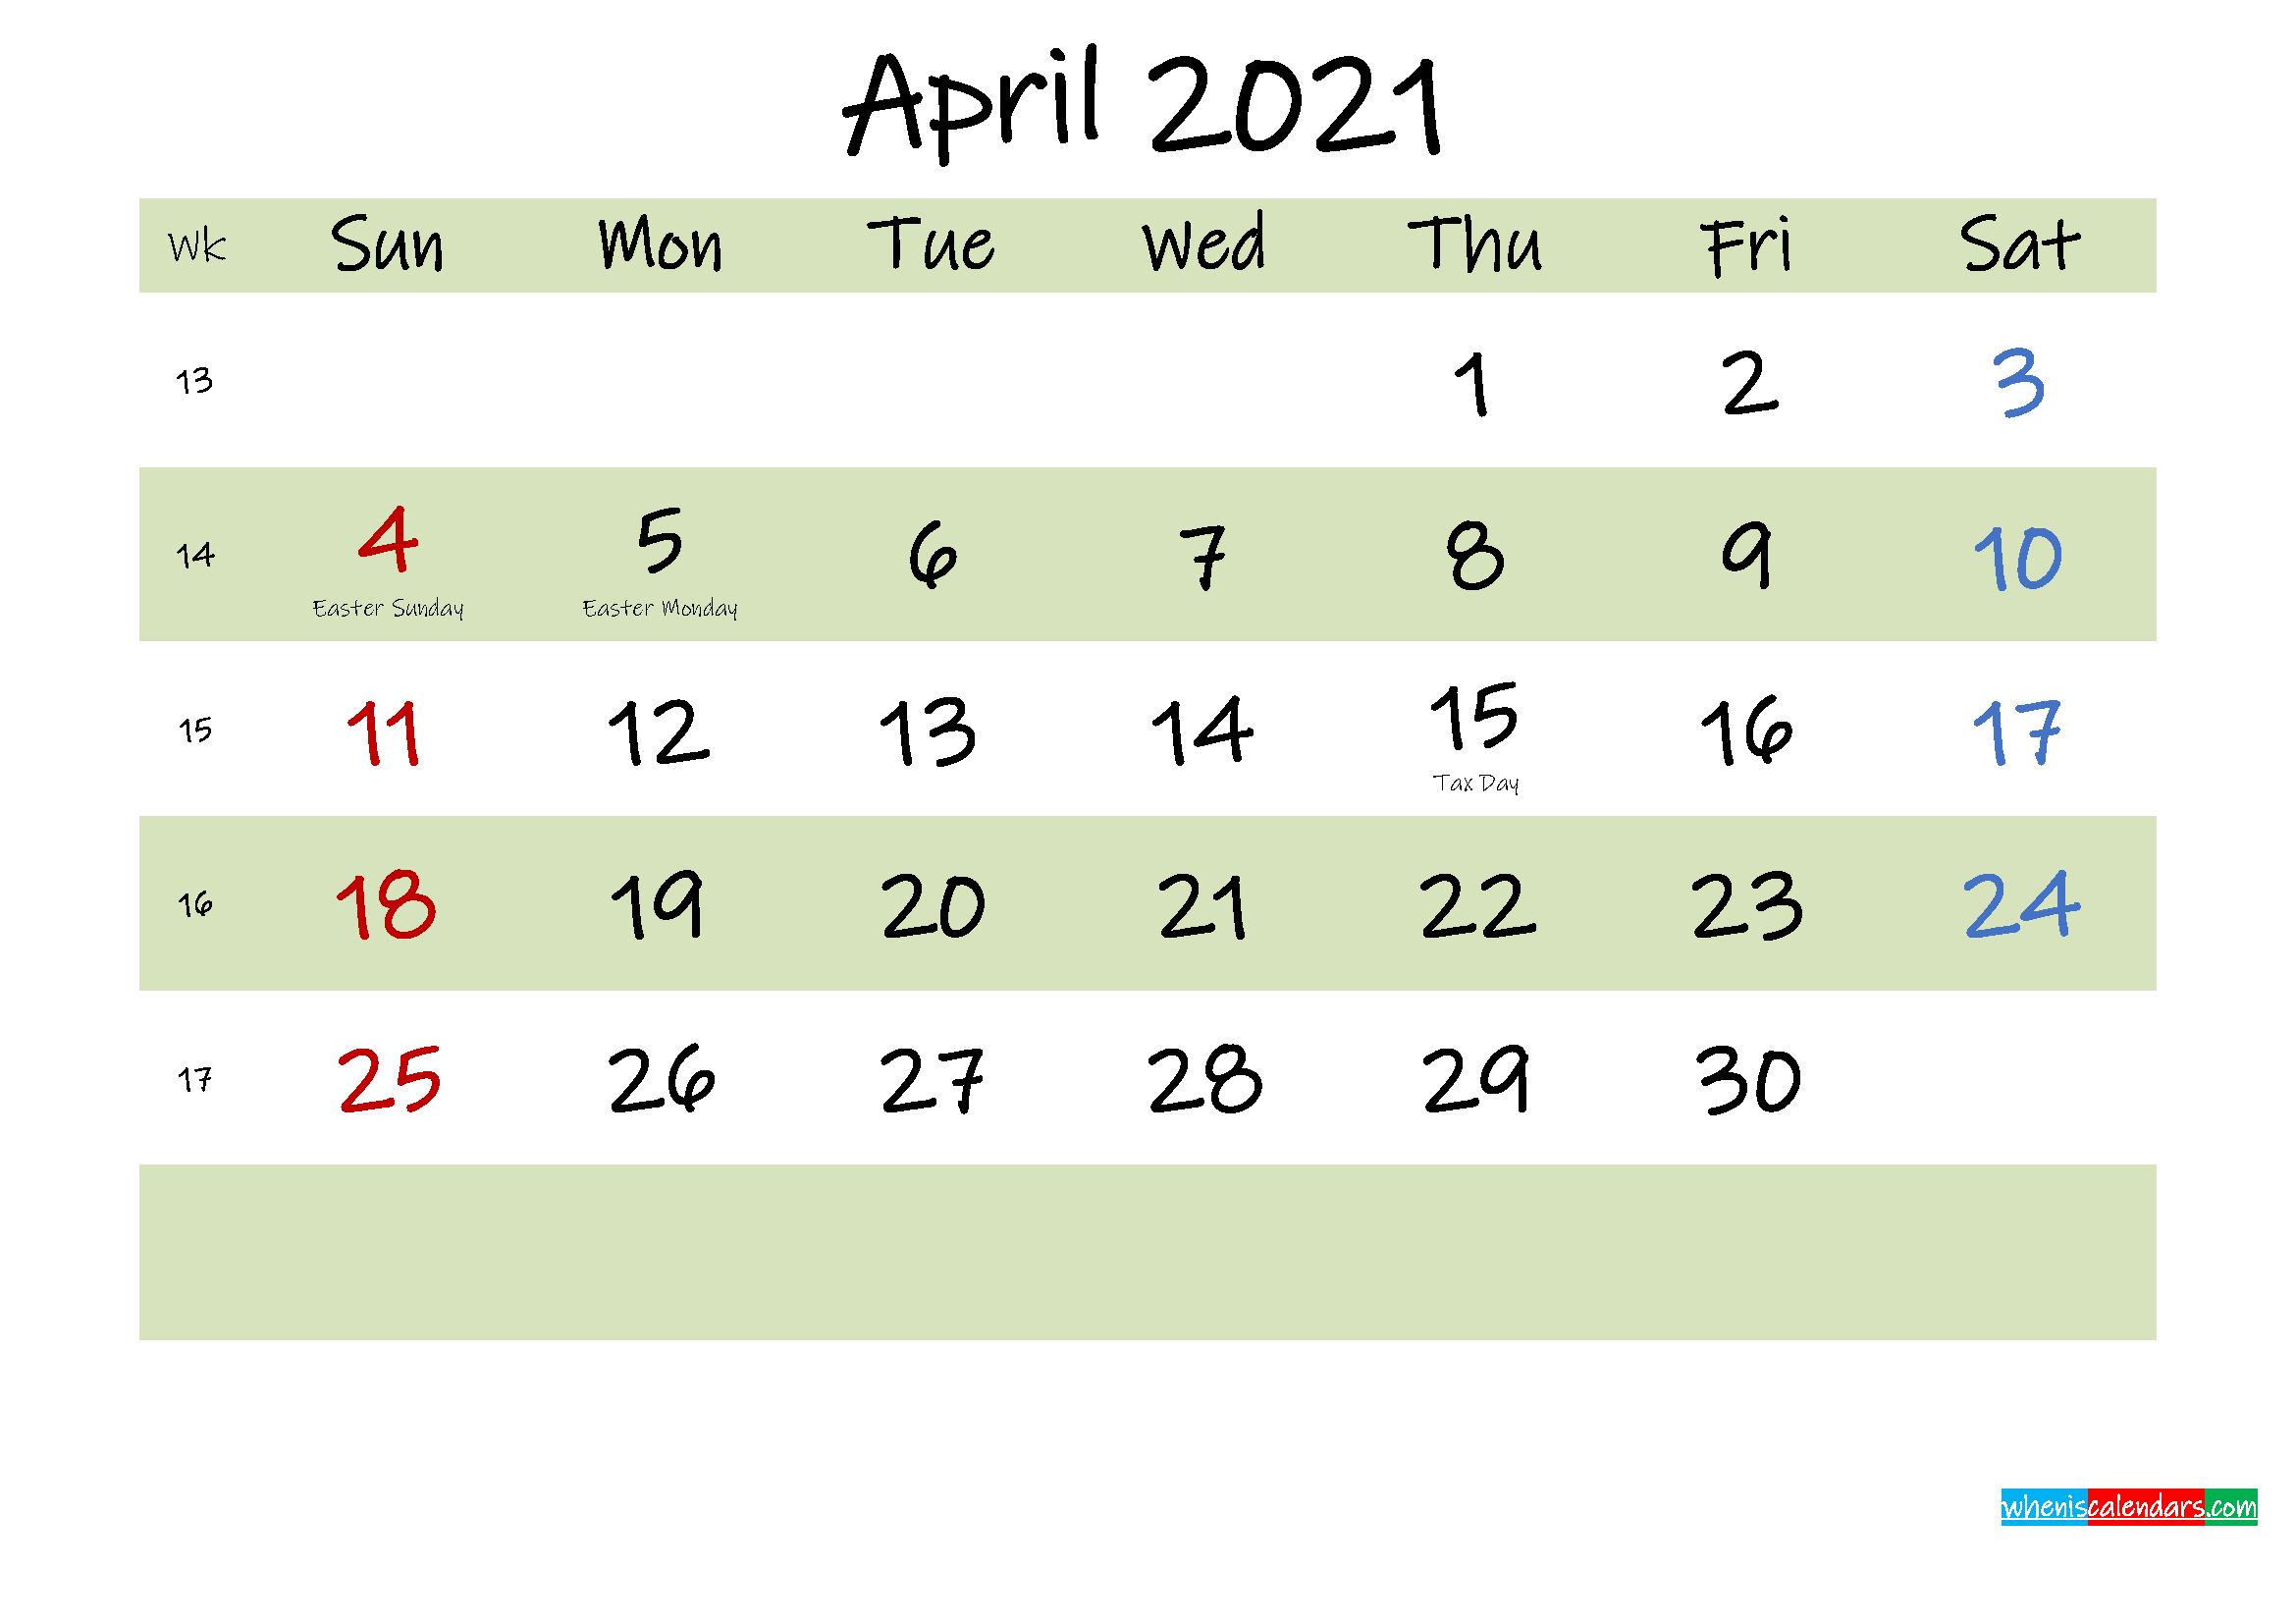 Free Printable April 2021 Calendar with Holidays